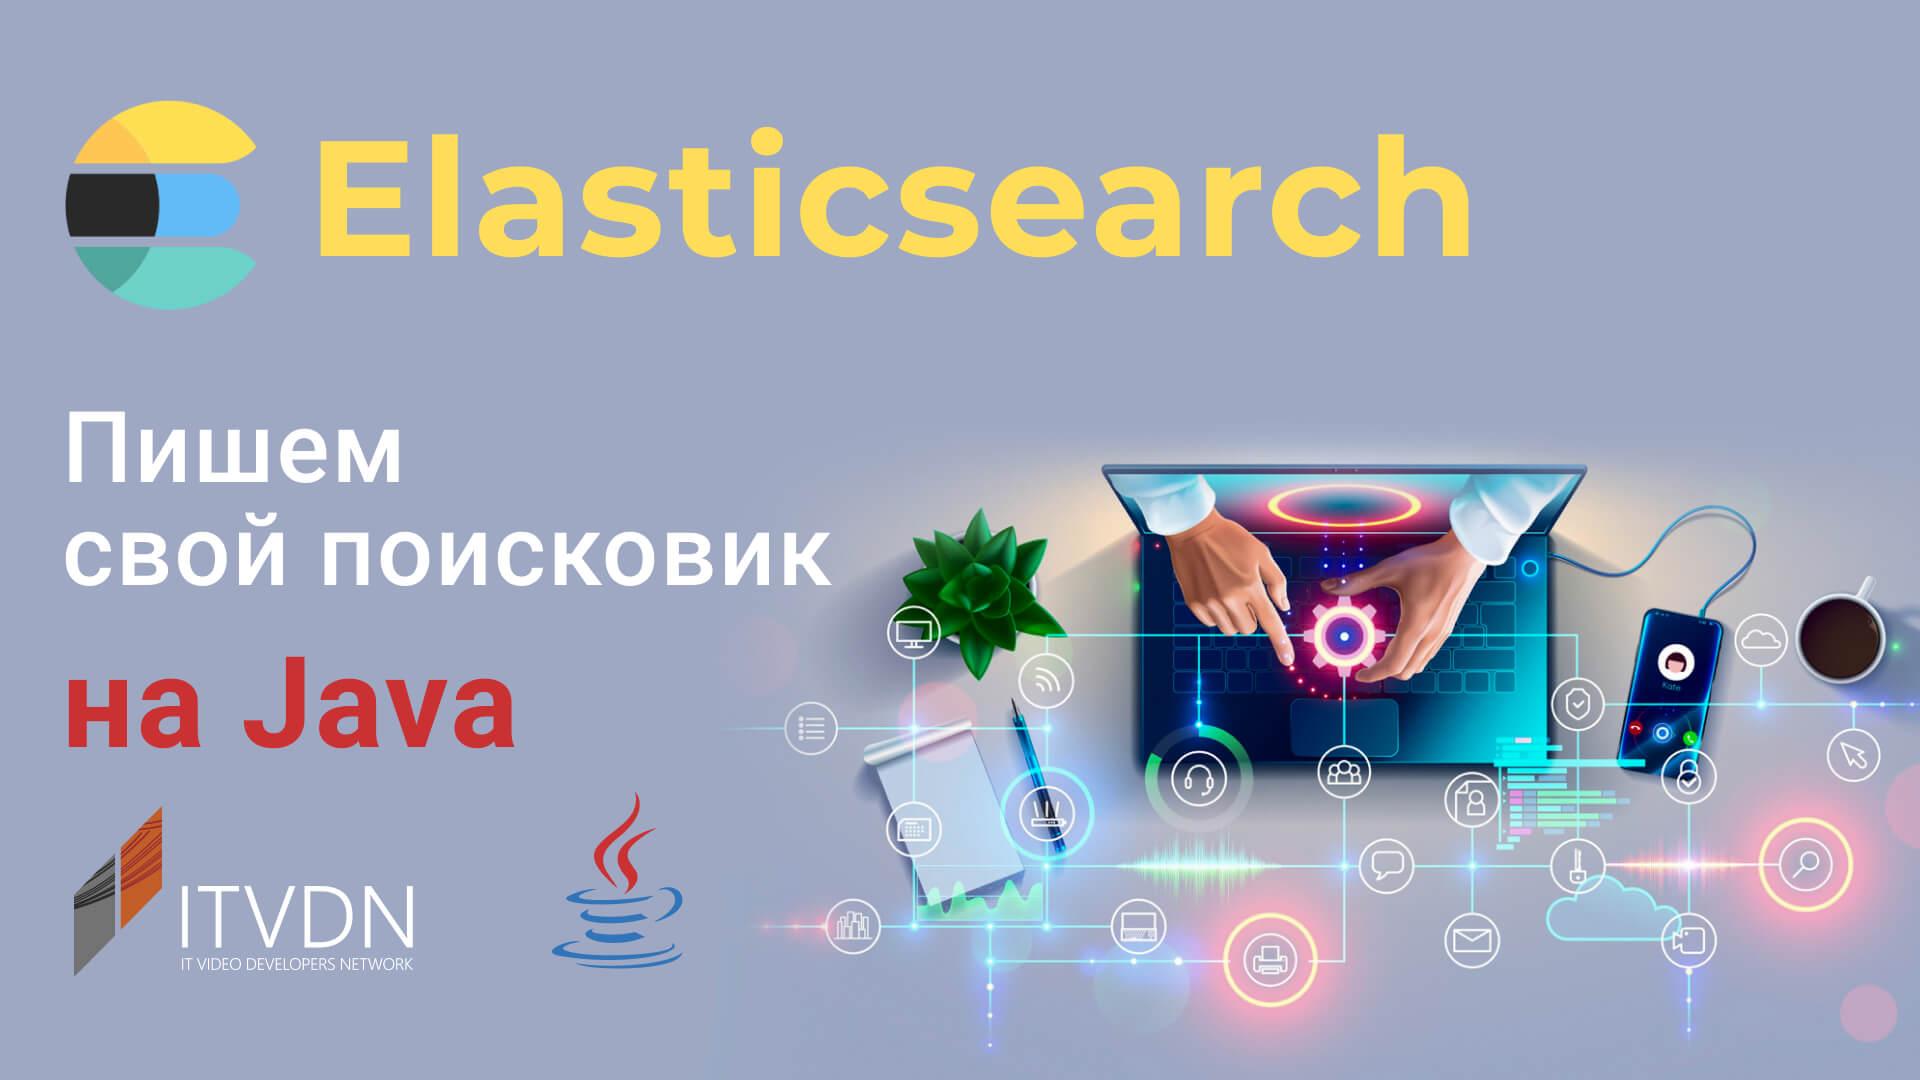 Elasticsearch - пишем свой поисковик на Java